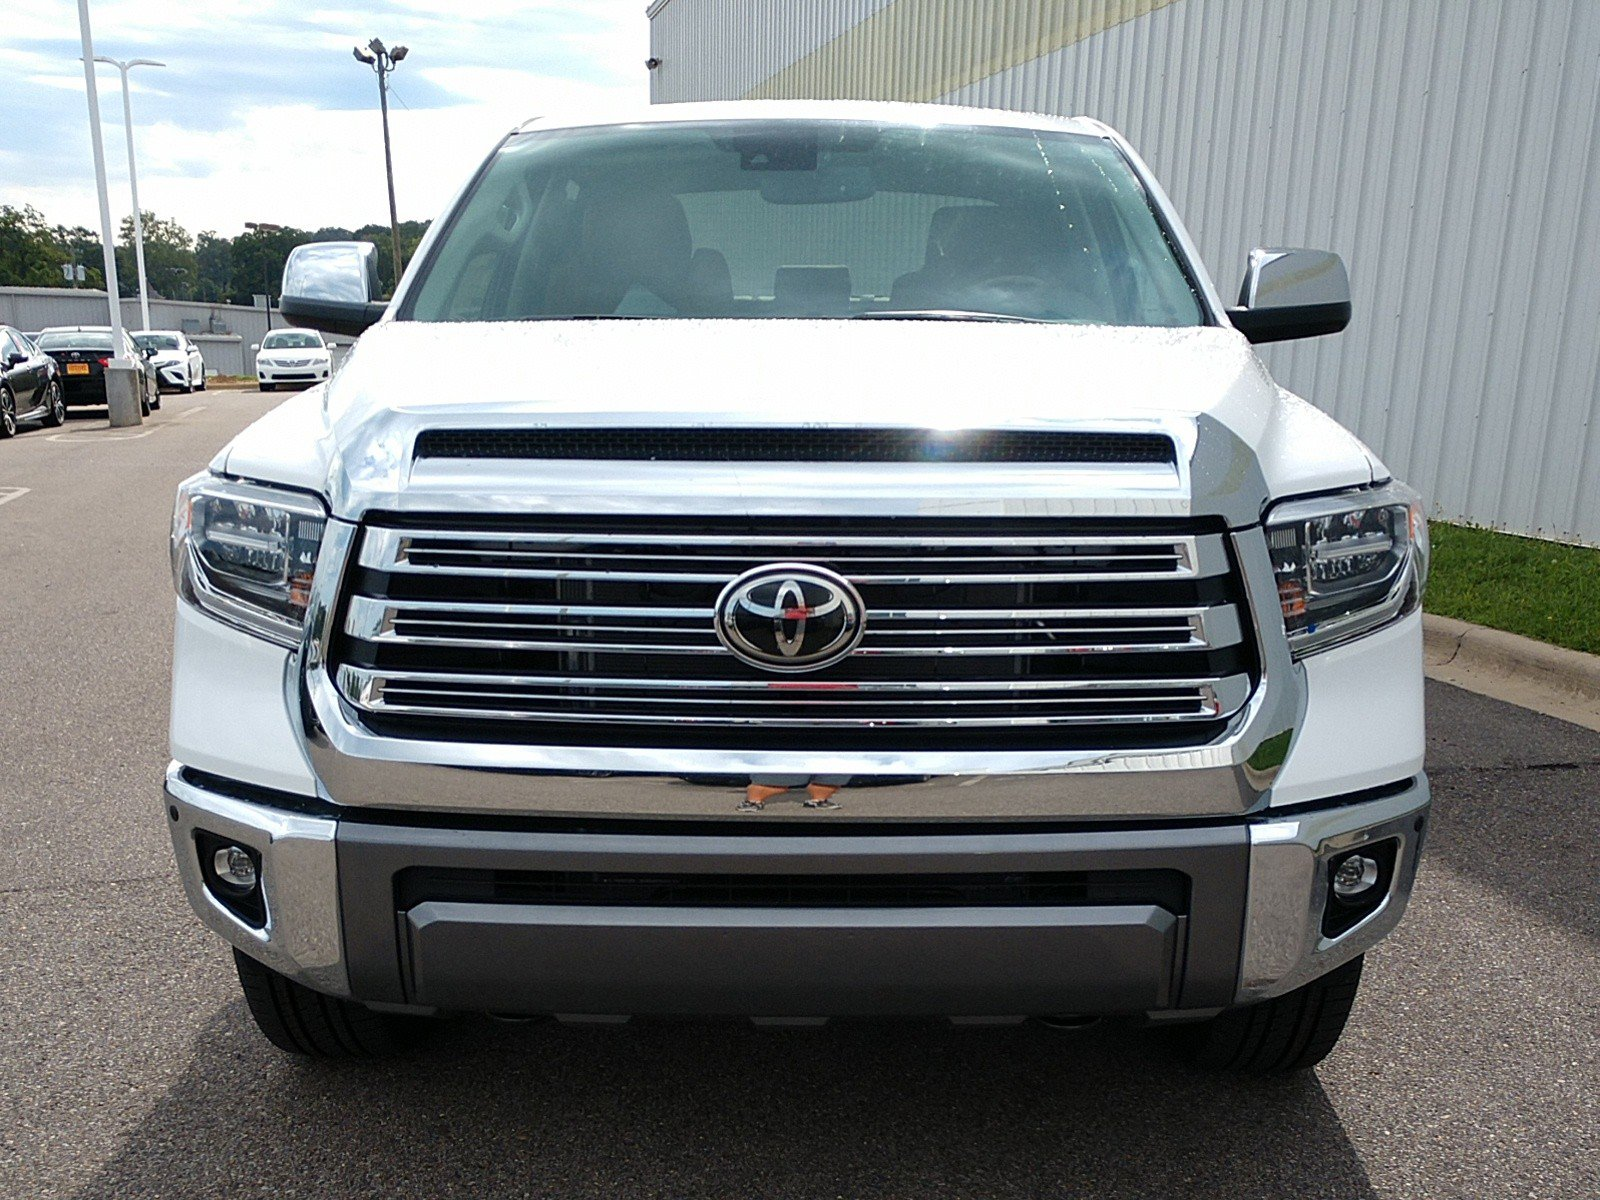 New 2020 Toyota Tundra 1794 Edition